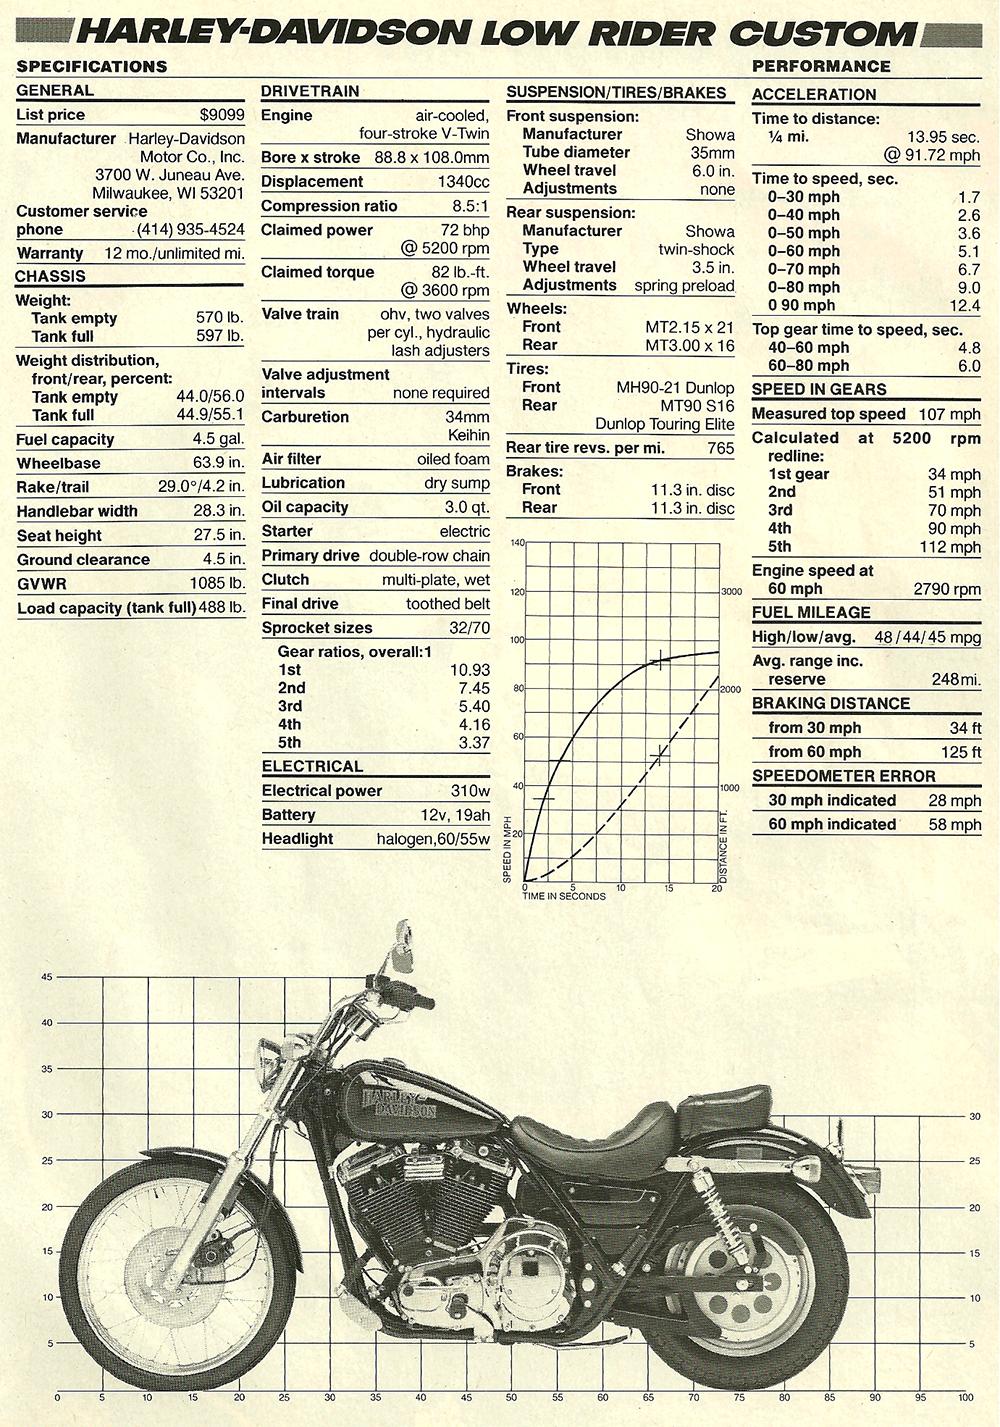 1987 Harley low rider custom fxlr road test 04.jpg